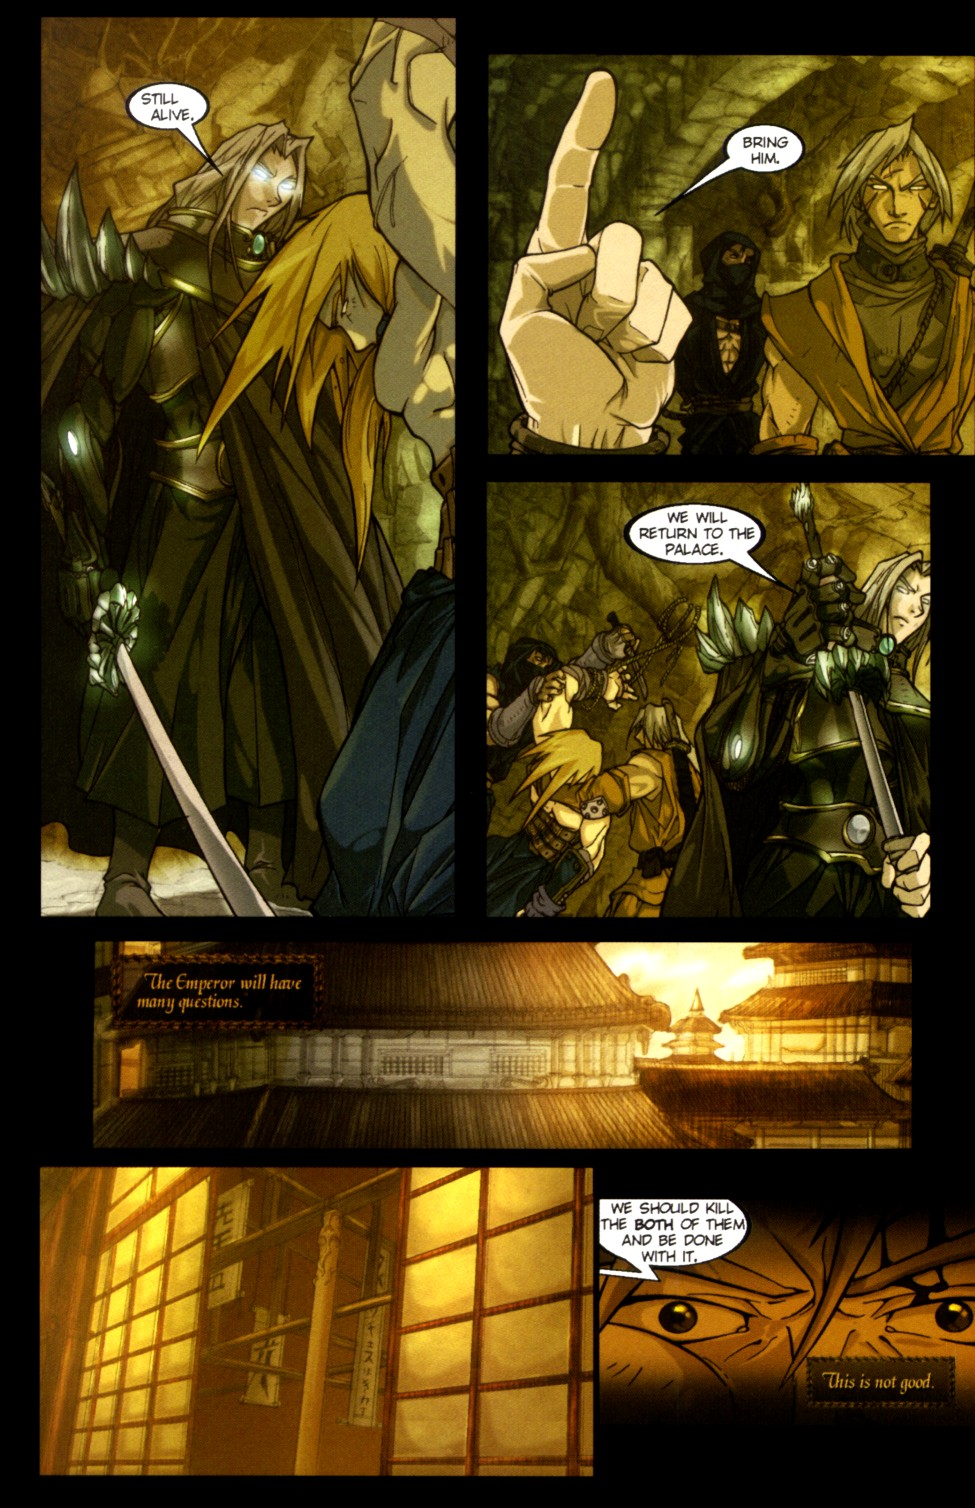 Read online Shidima comic -  Issue #3 - 21